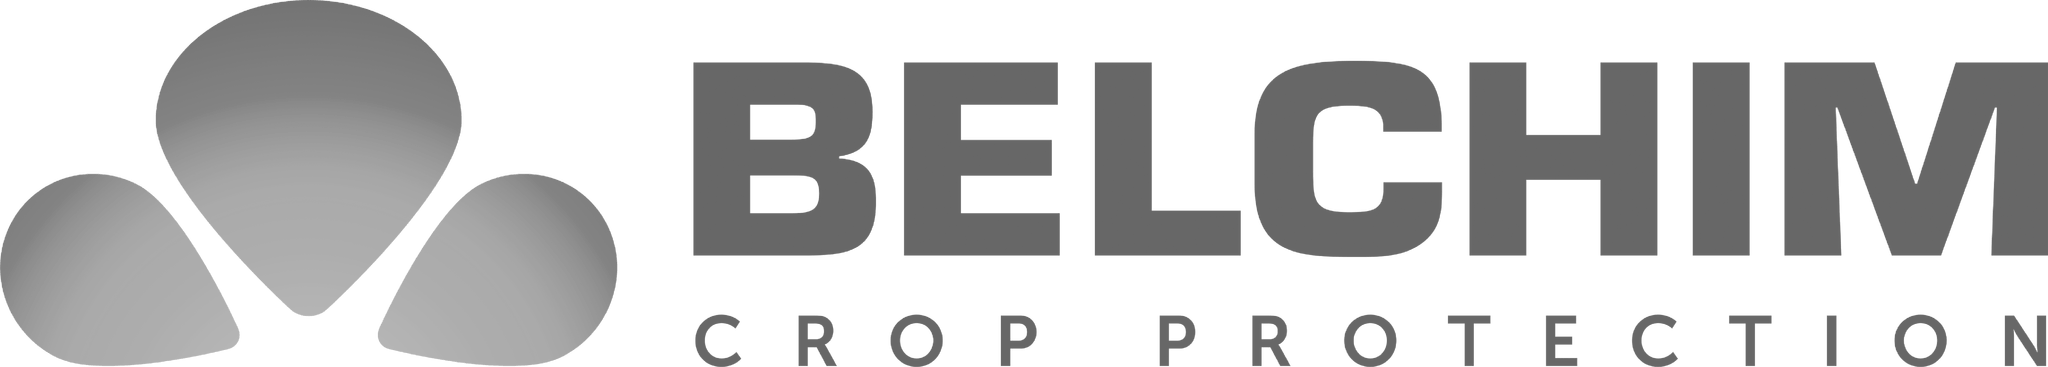 Belchium Crop Protection Logo_Internet_BW.png